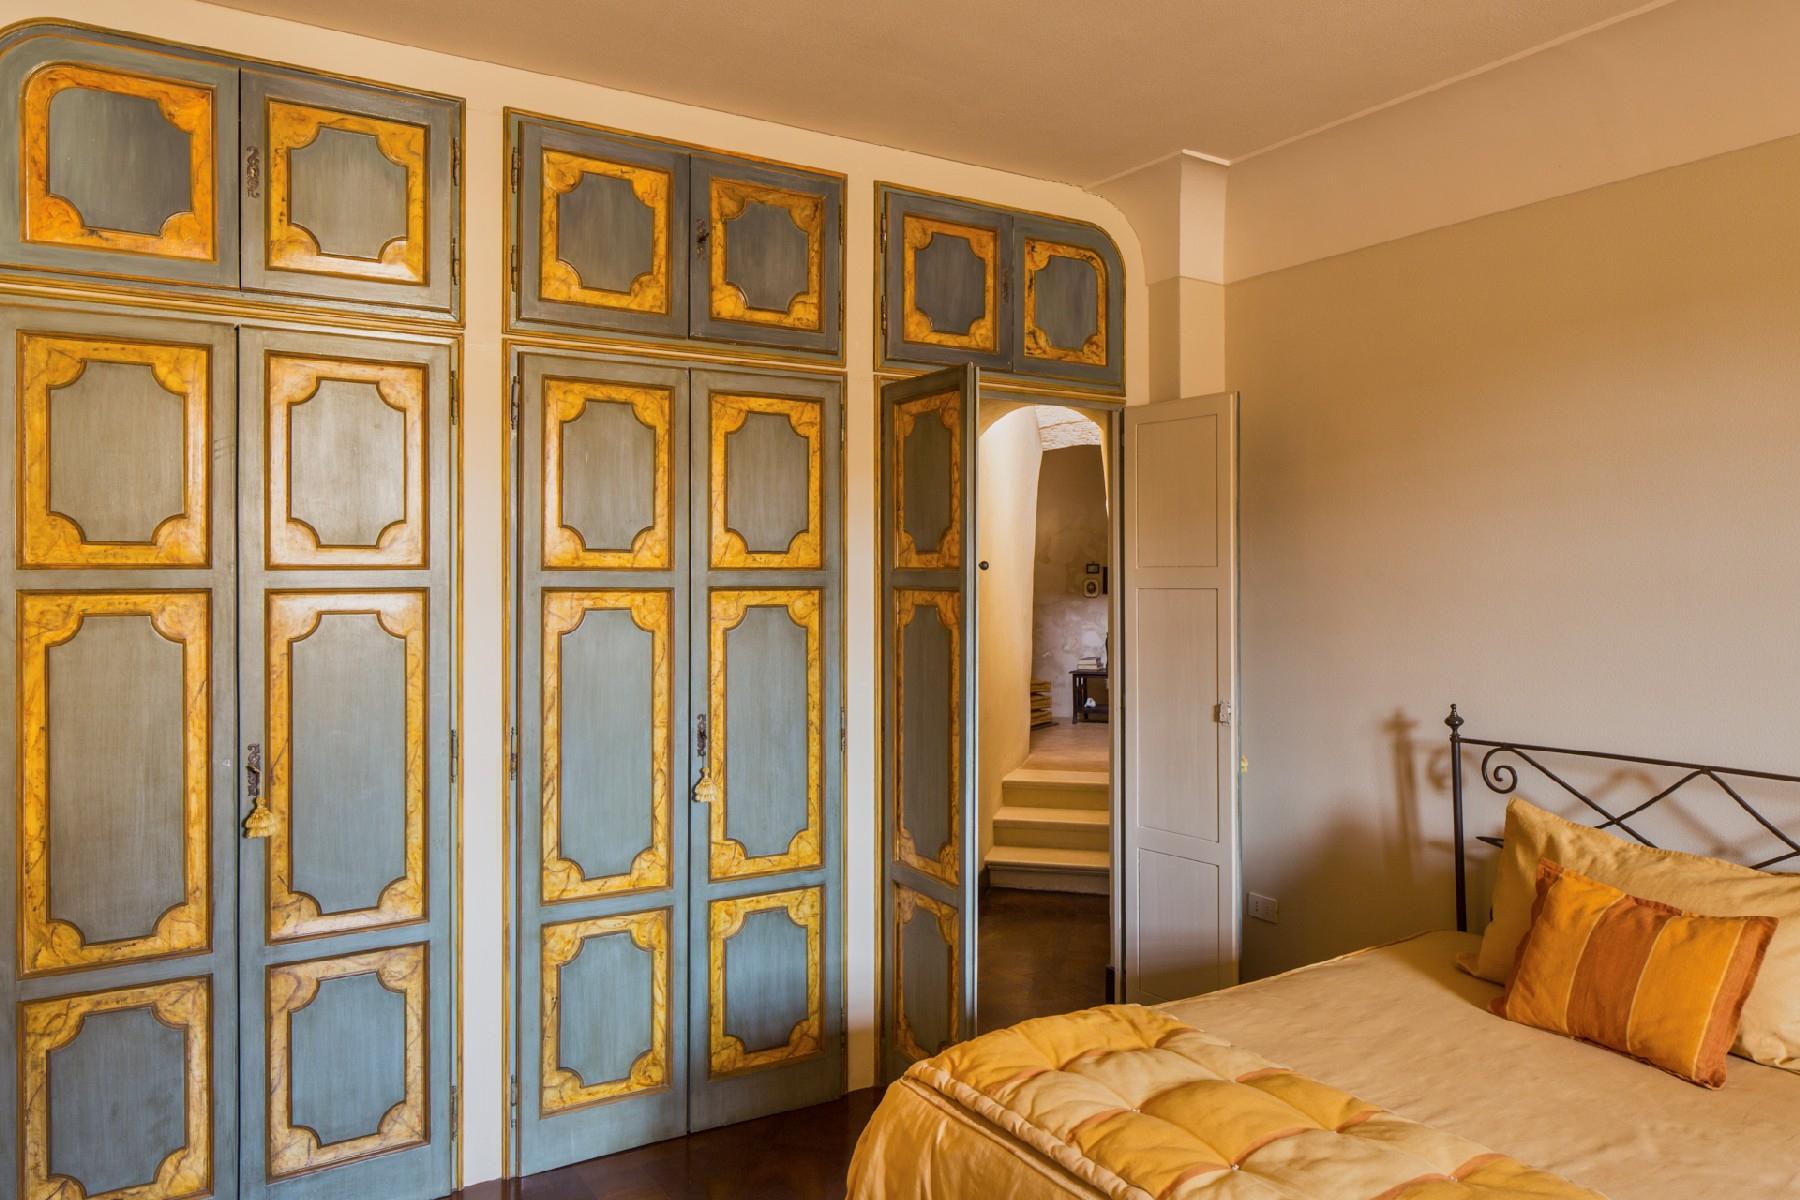 Villa in Vendita a Tricase: 5 locali, 1700 mq - Foto 15